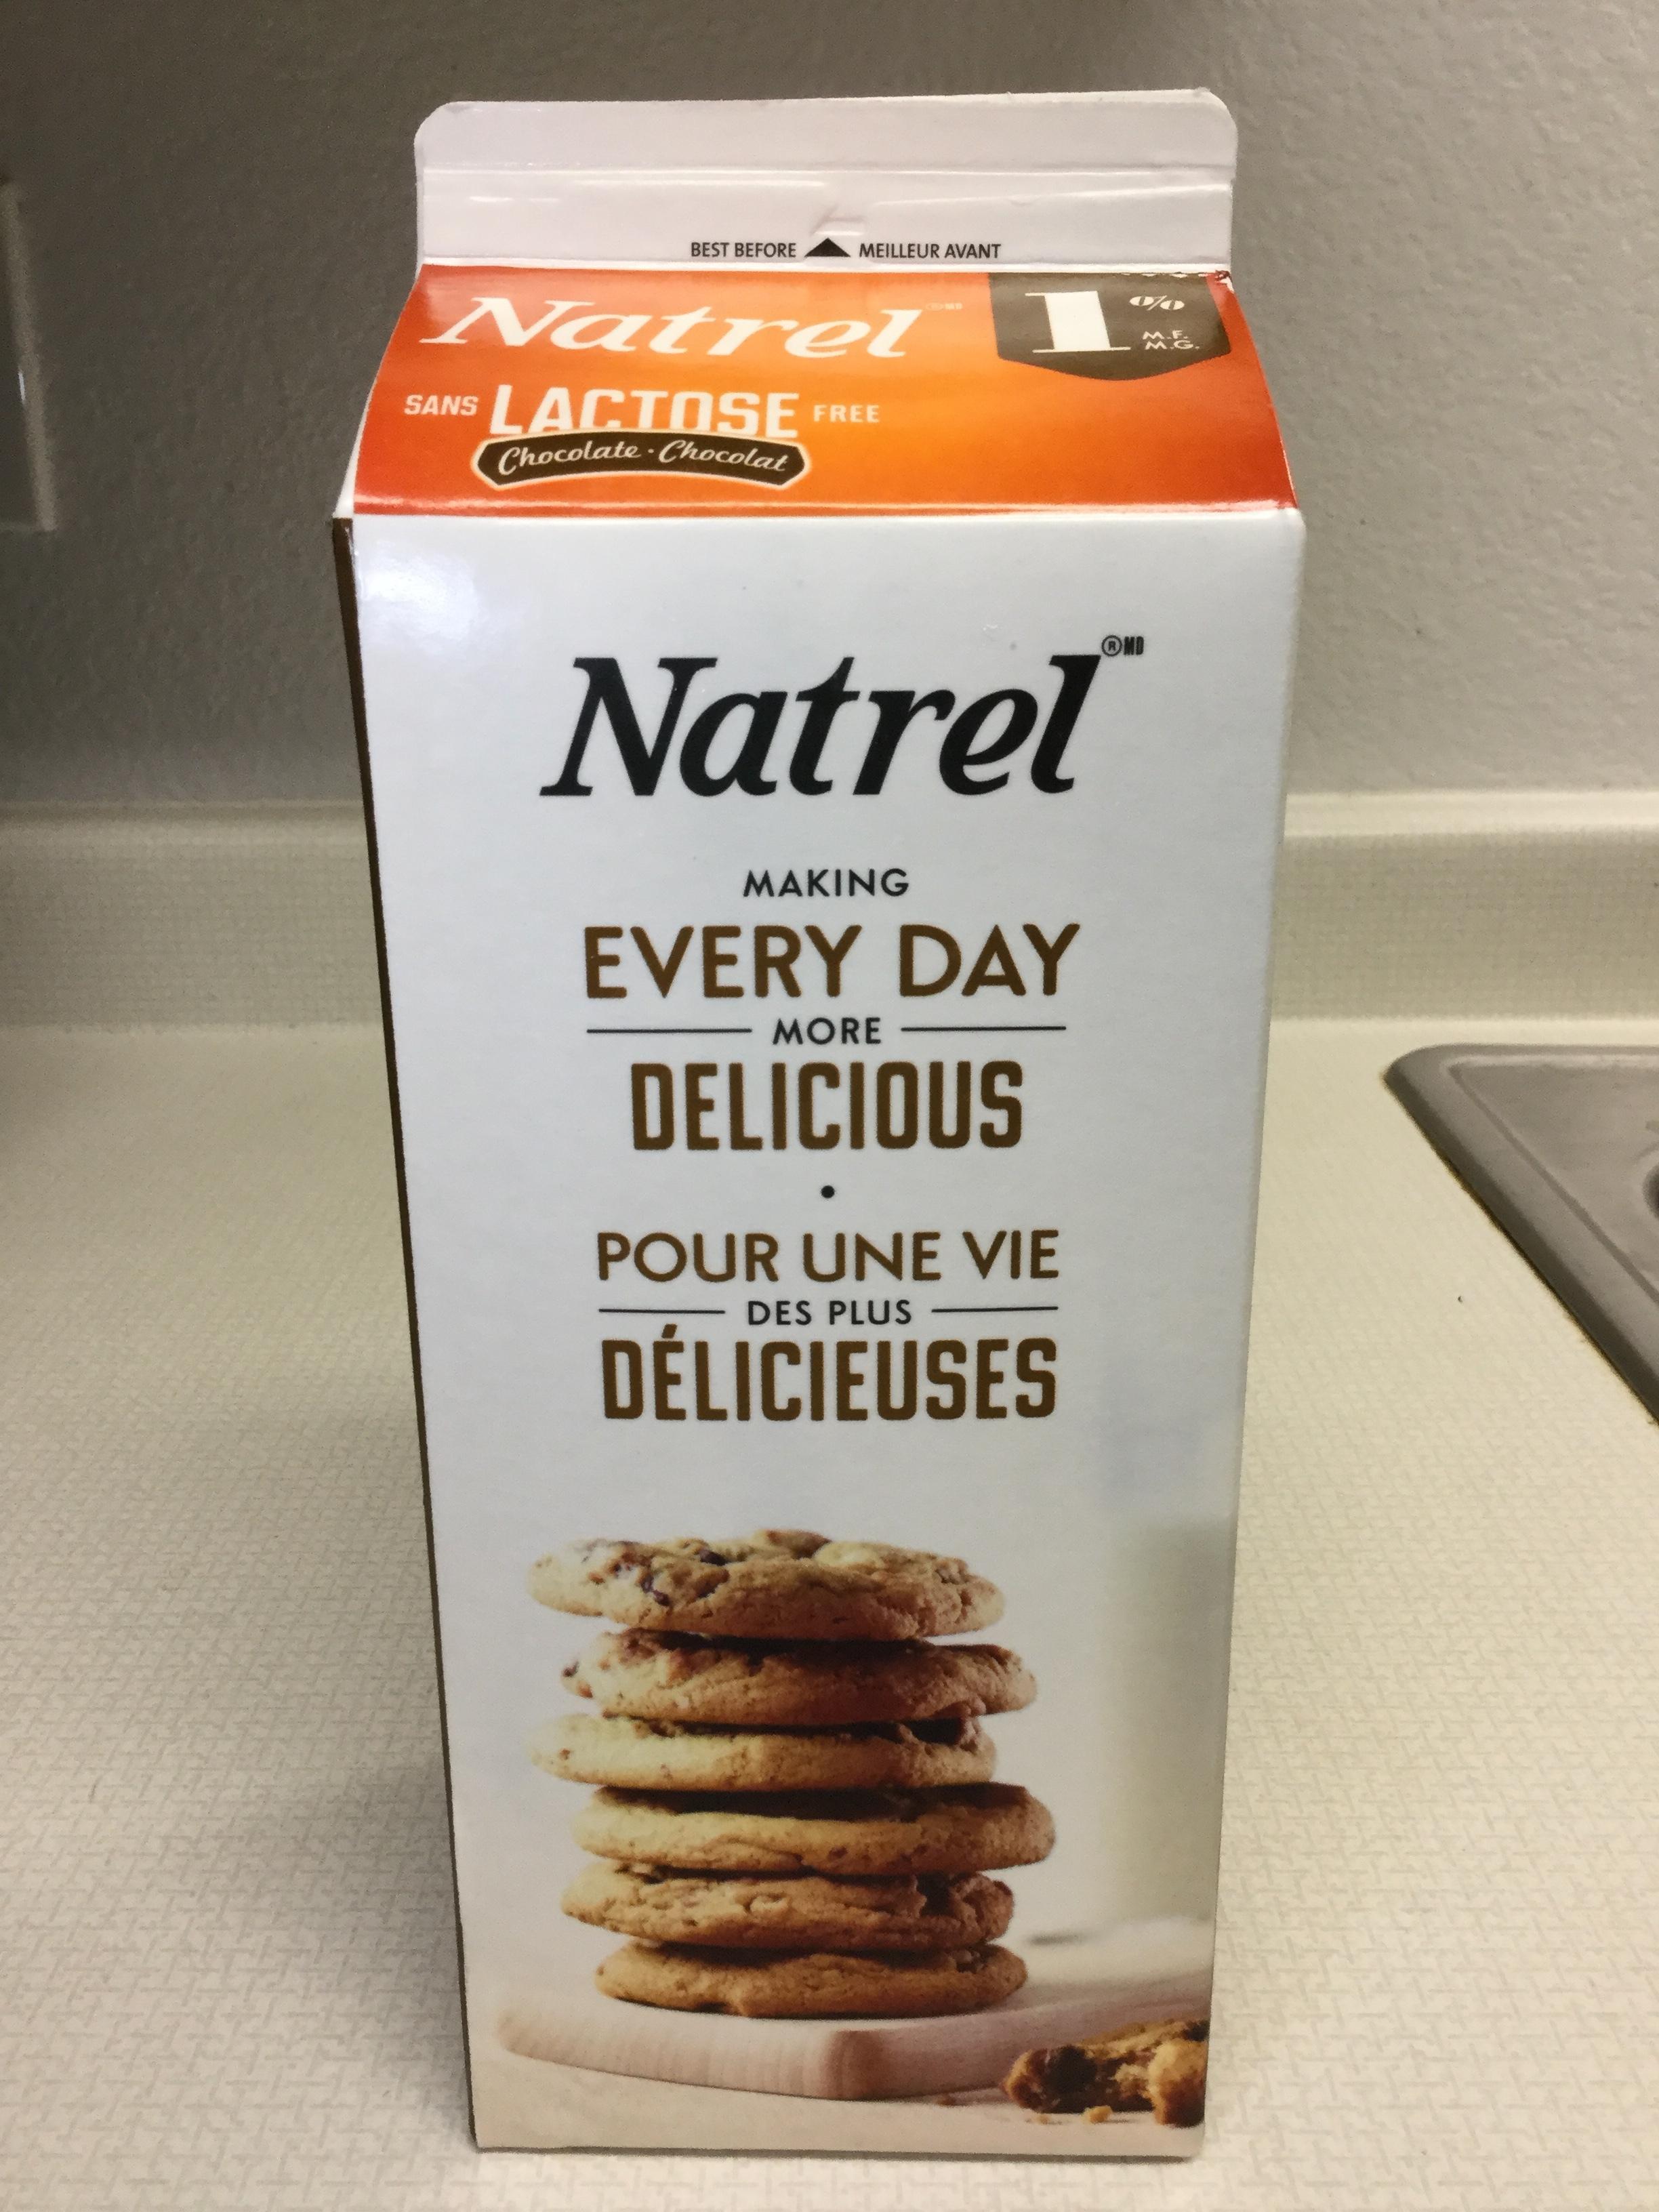 Natrel Lactose Free Chocolate Milk Side 3